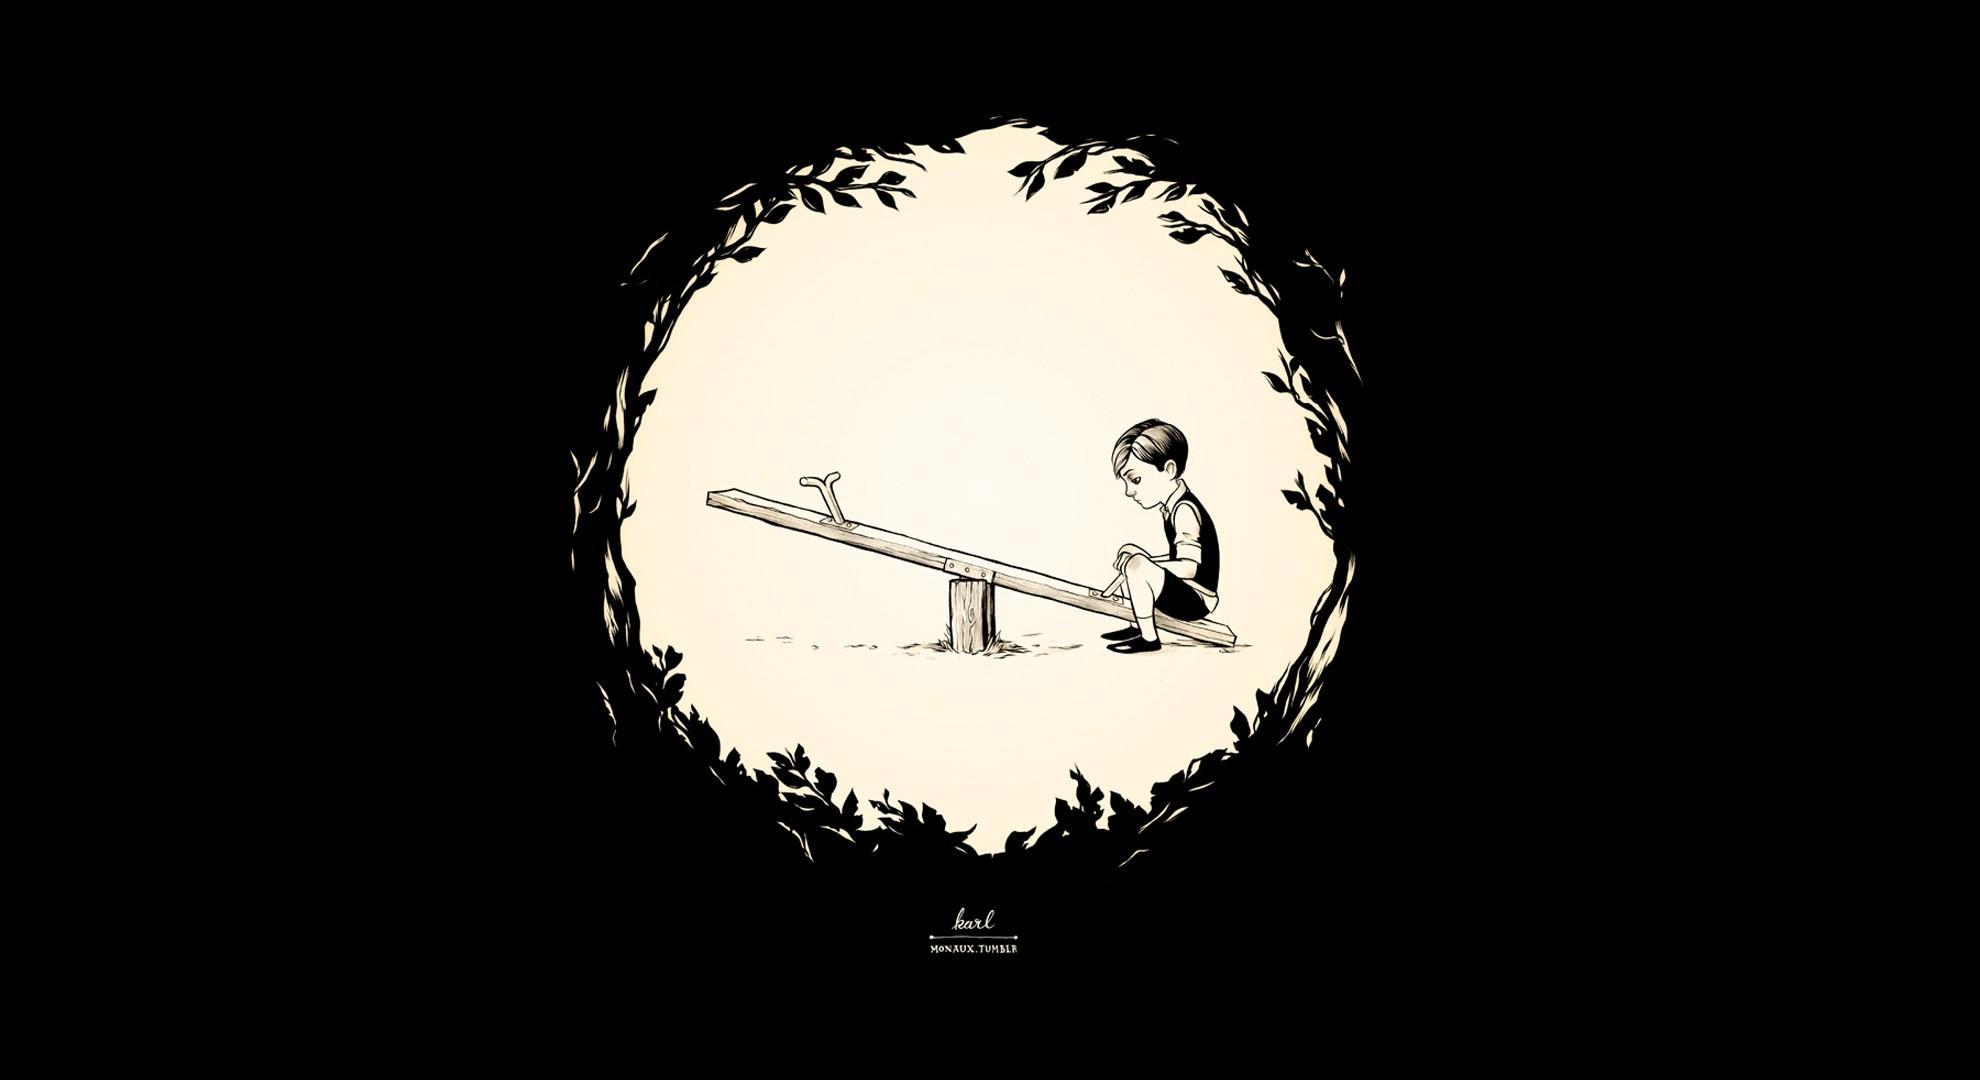 minimalistic kids alone playground black background - Wallpaper (#2117118) / Wallbase.cc